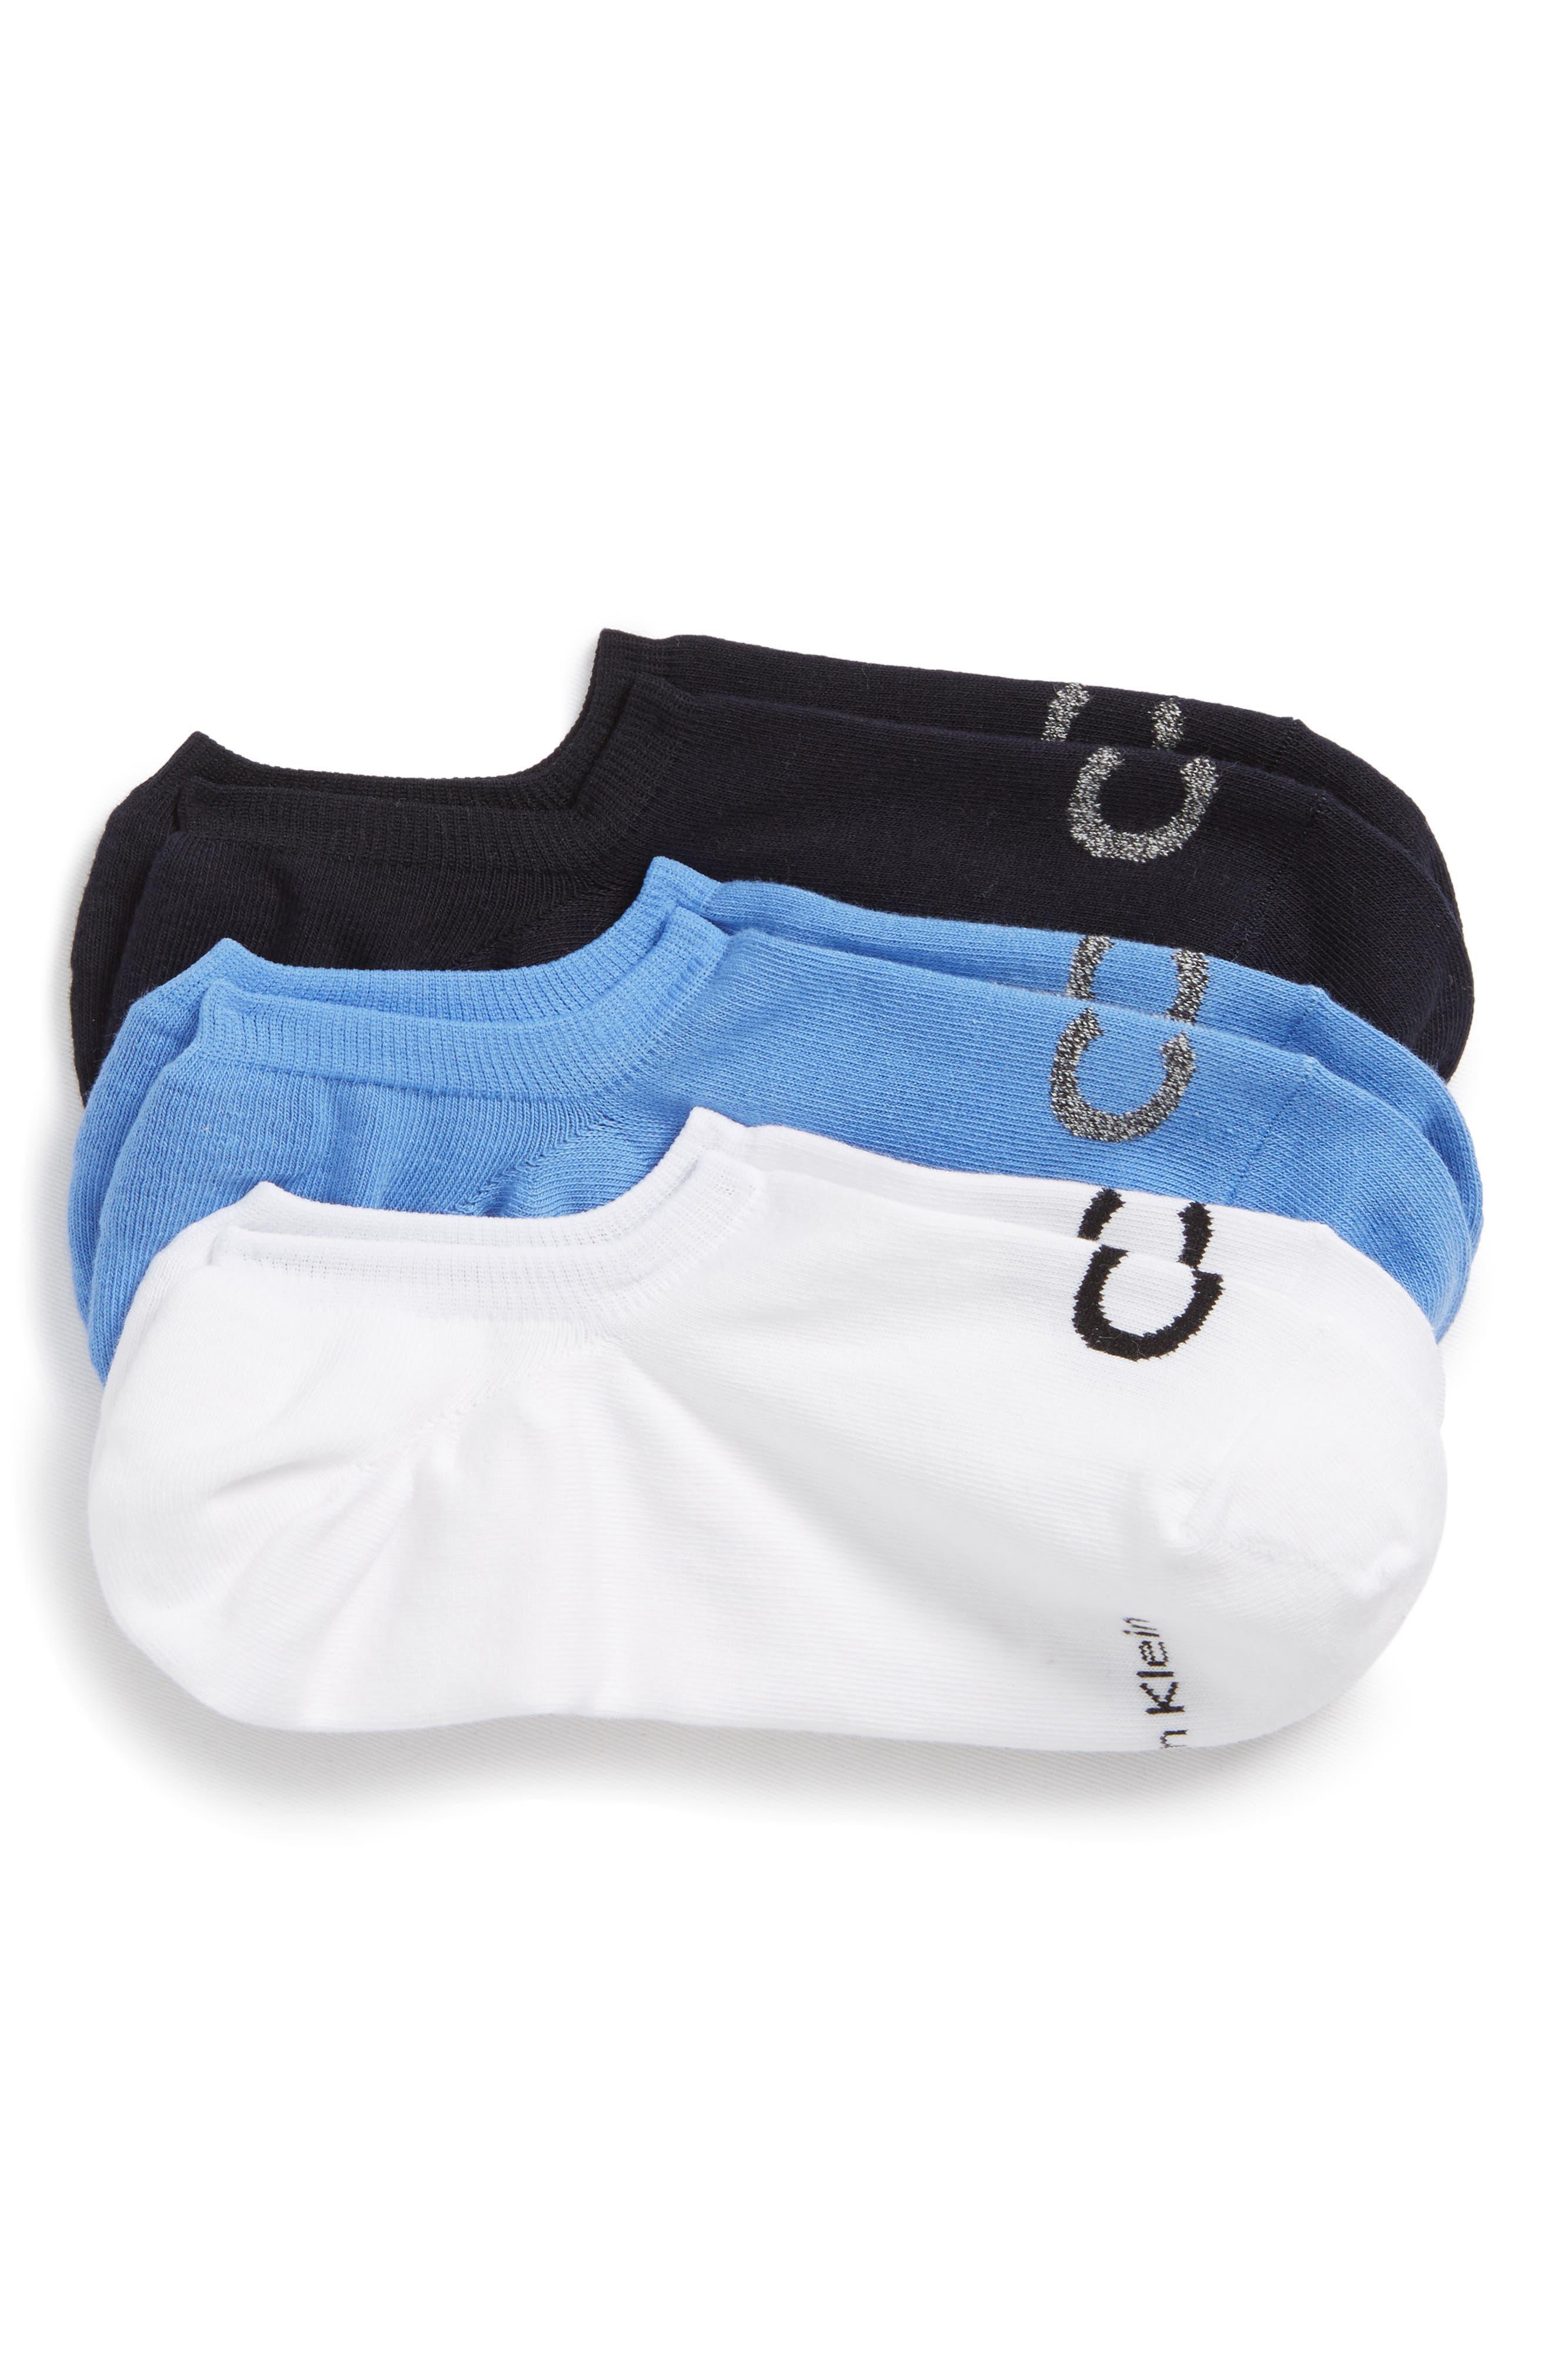 3-Pack No-Show Socks,                             Main thumbnail 1, color,                             ULTRAMARINE/ NAVY/ WHITE